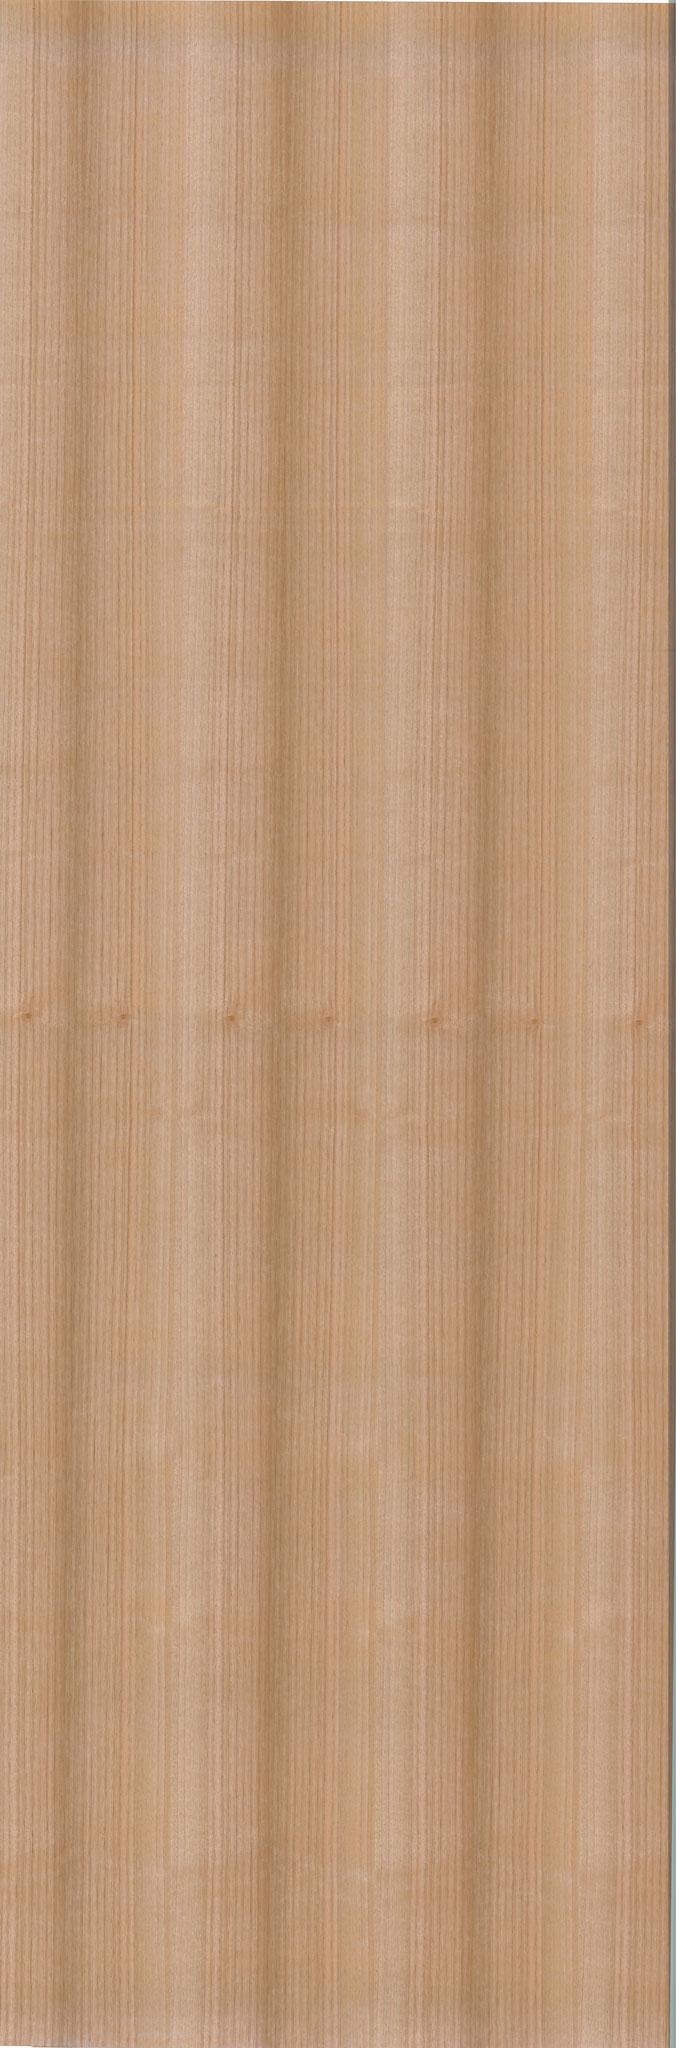 Eucalyptus Plain QC